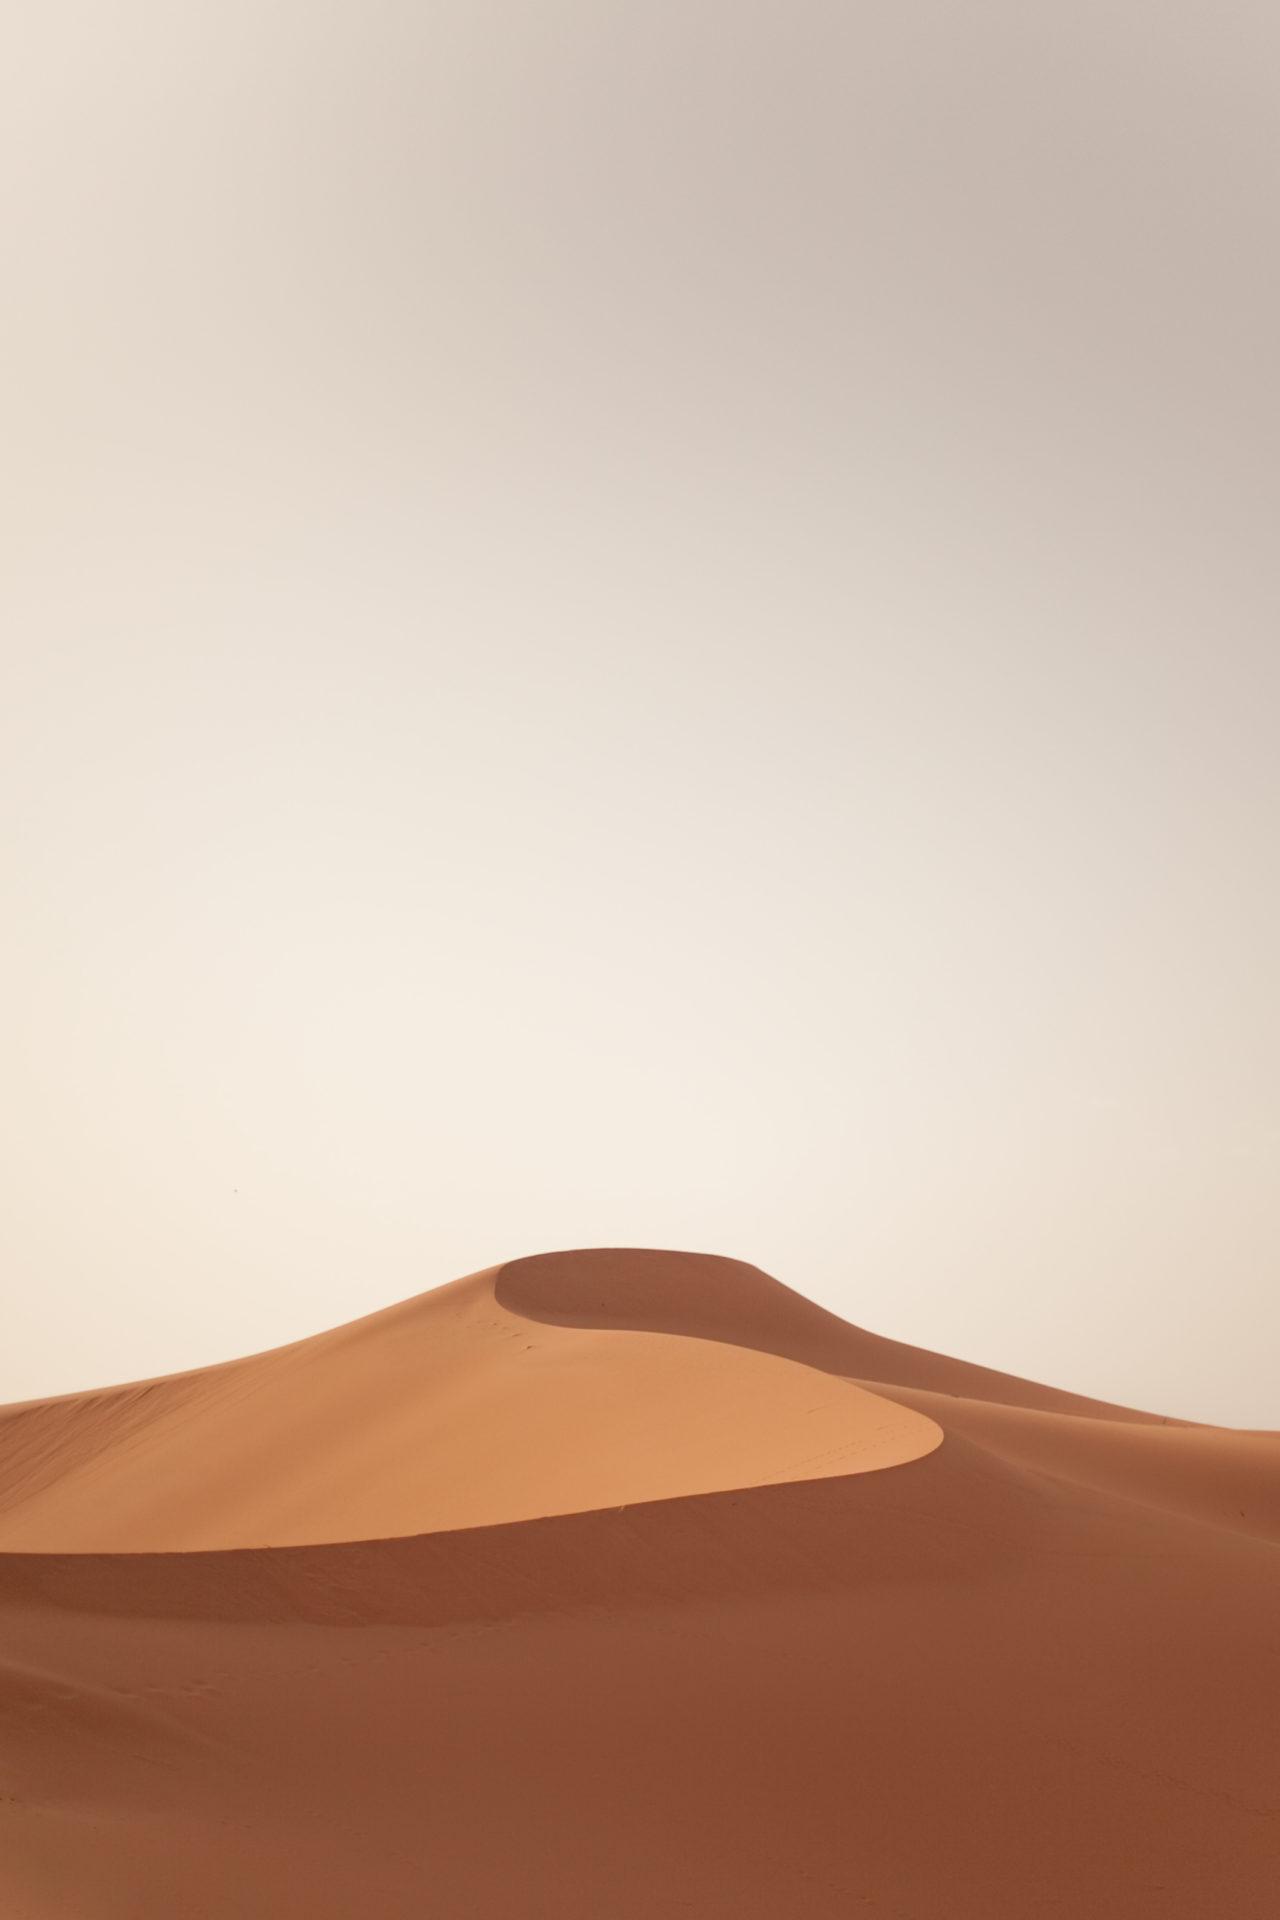 Sahara dune, by Tiago Ribeiro